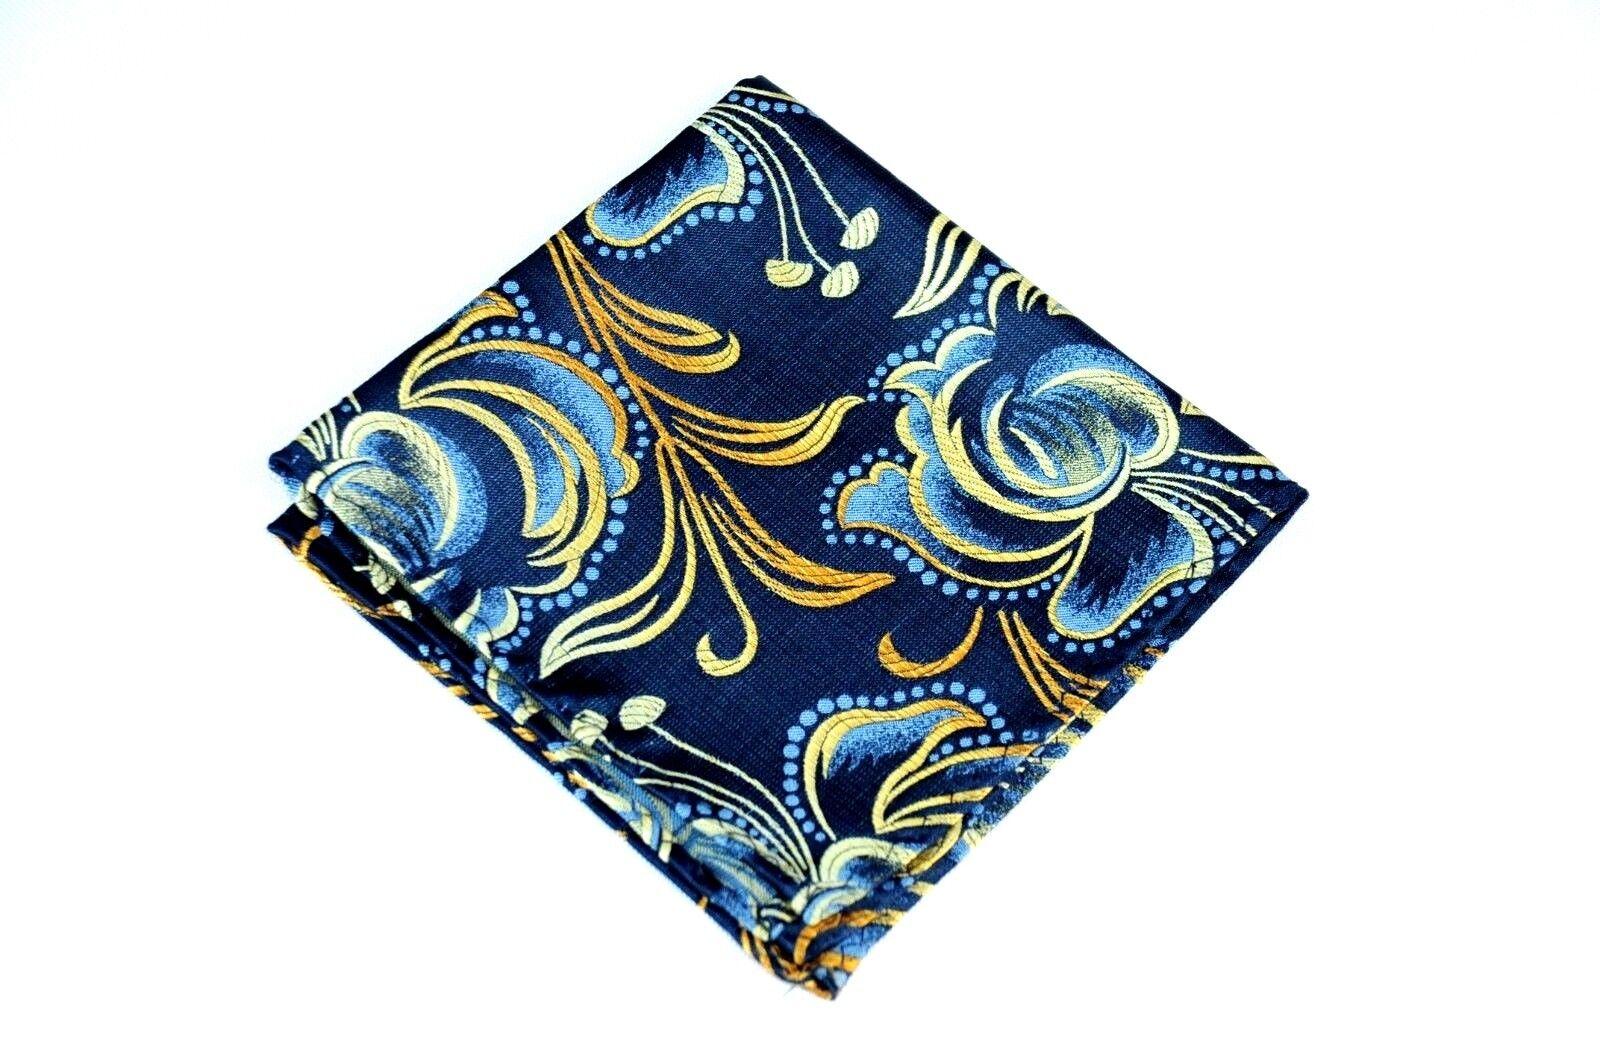 Lord R Colton Masterworks Pocket Square Bergamo Alta Yellow Tapestry $75 New